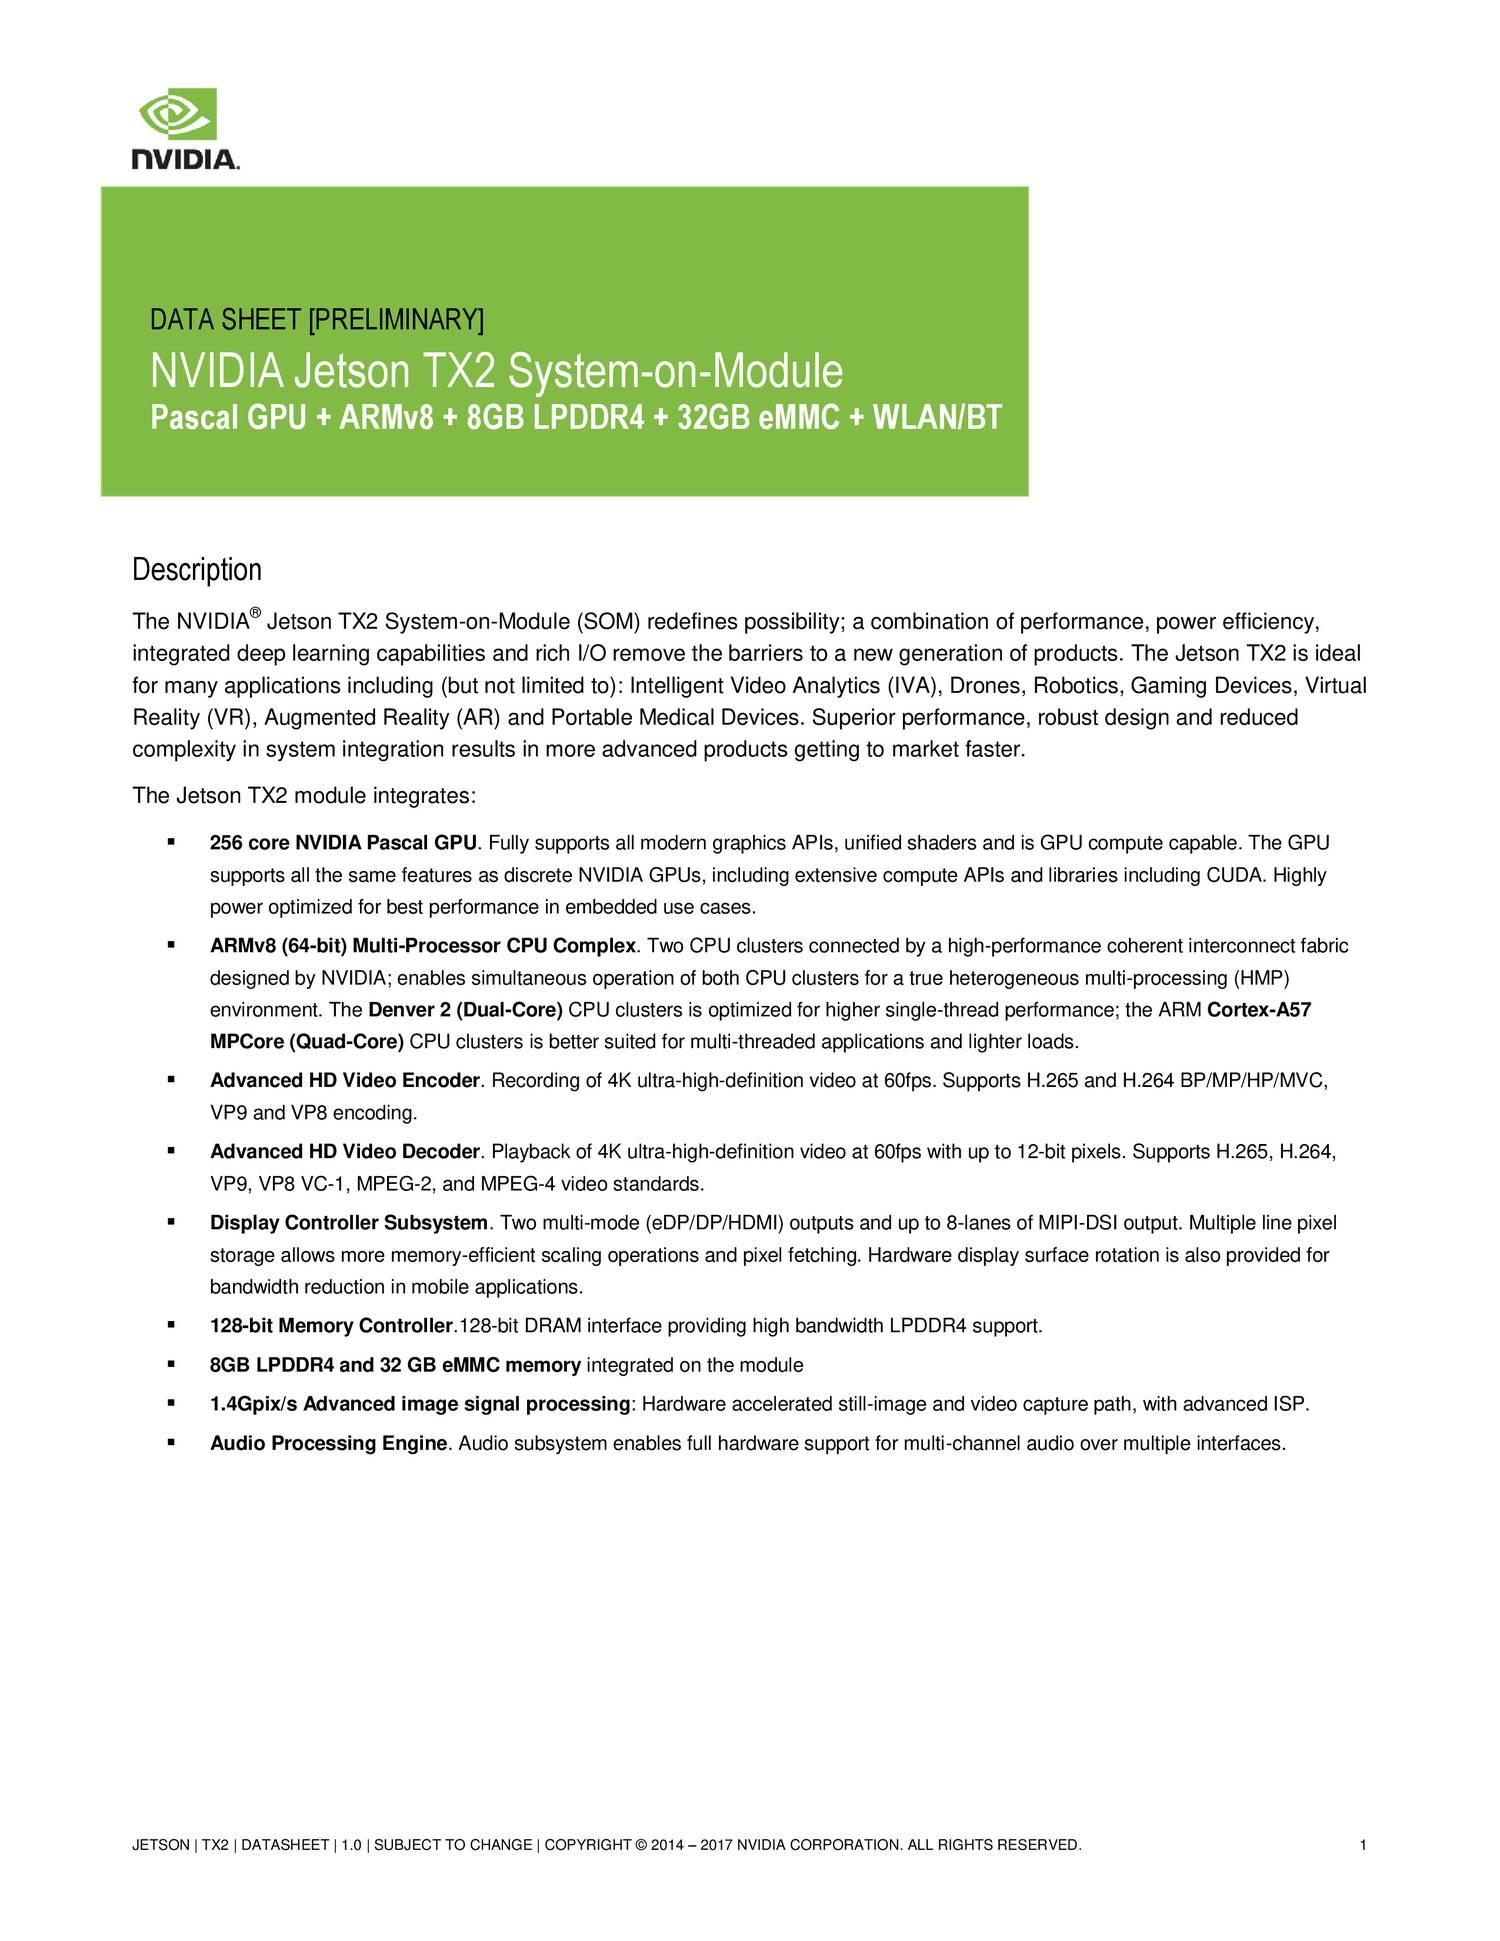 DATA SHEET - NVIDIA Jetson TX2 System-on-Module pdf | DocDroid